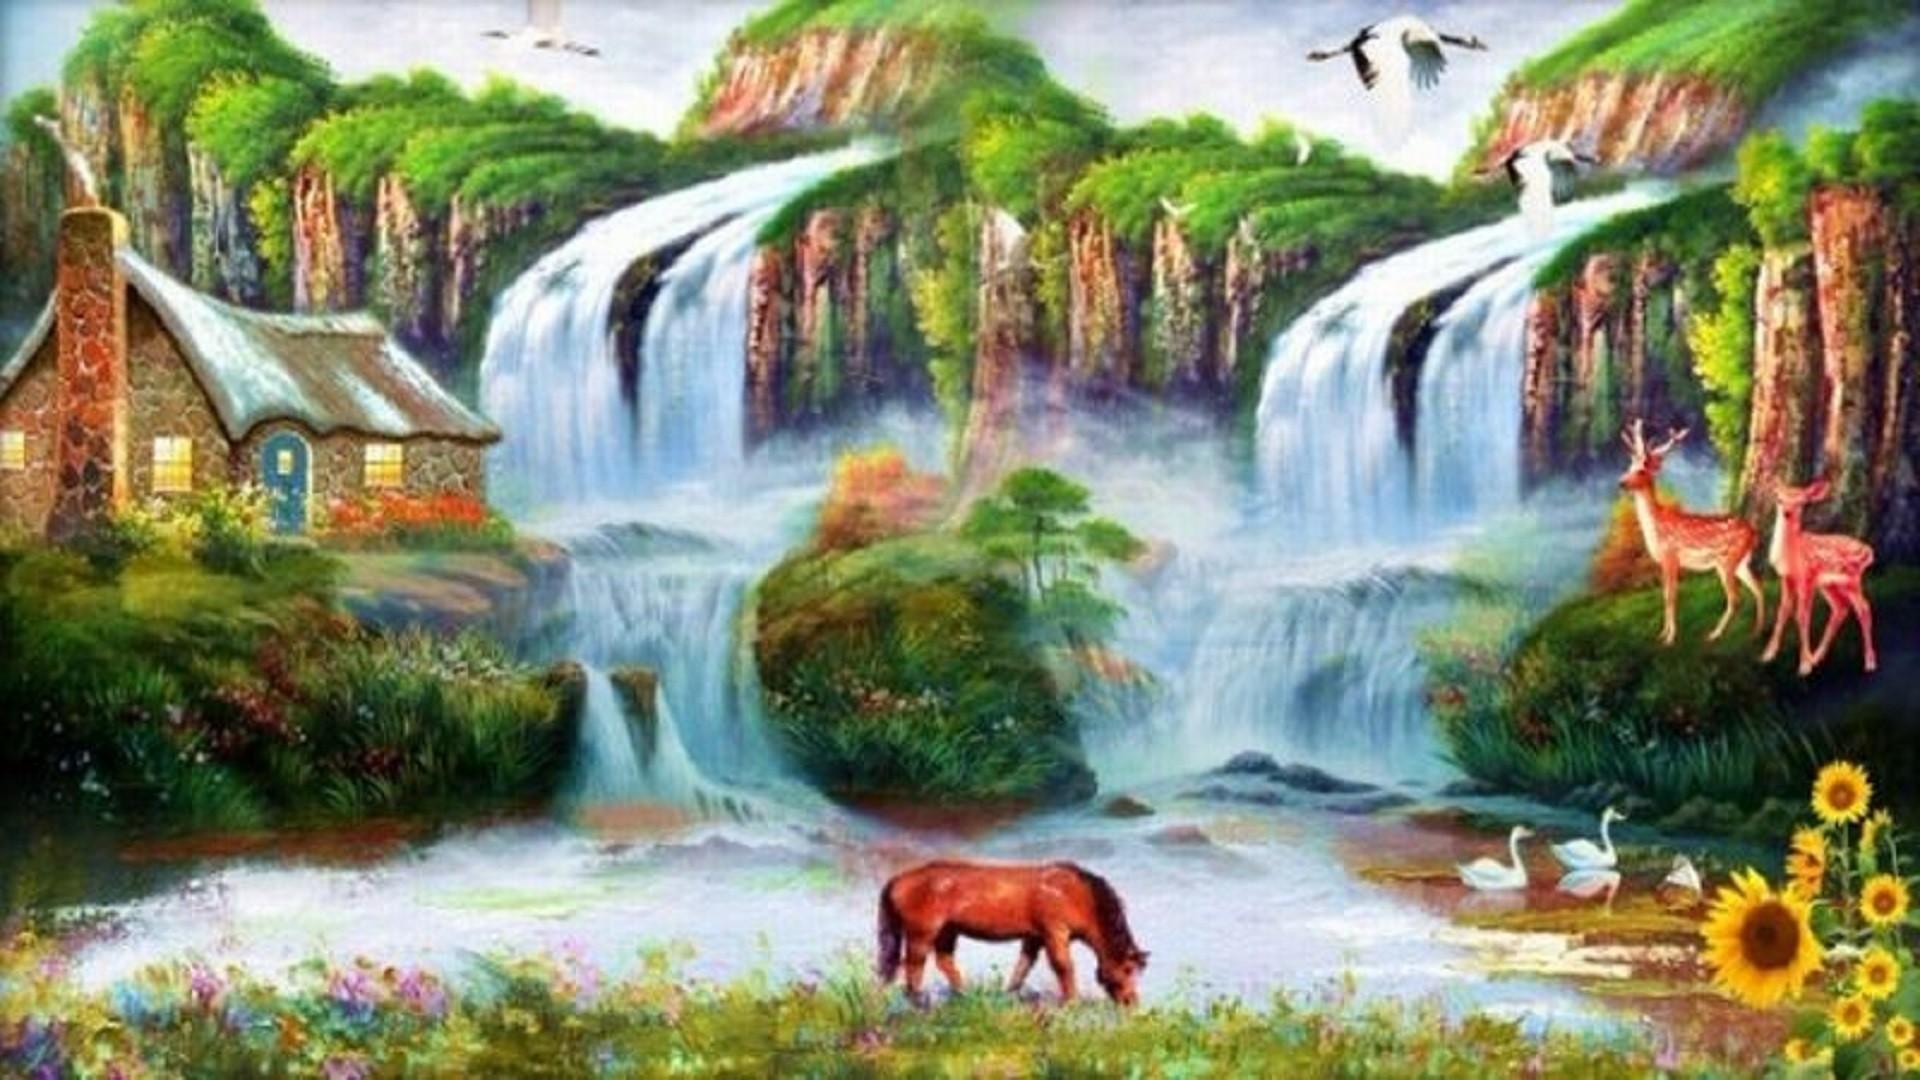 Wallpaper Natural Beauty